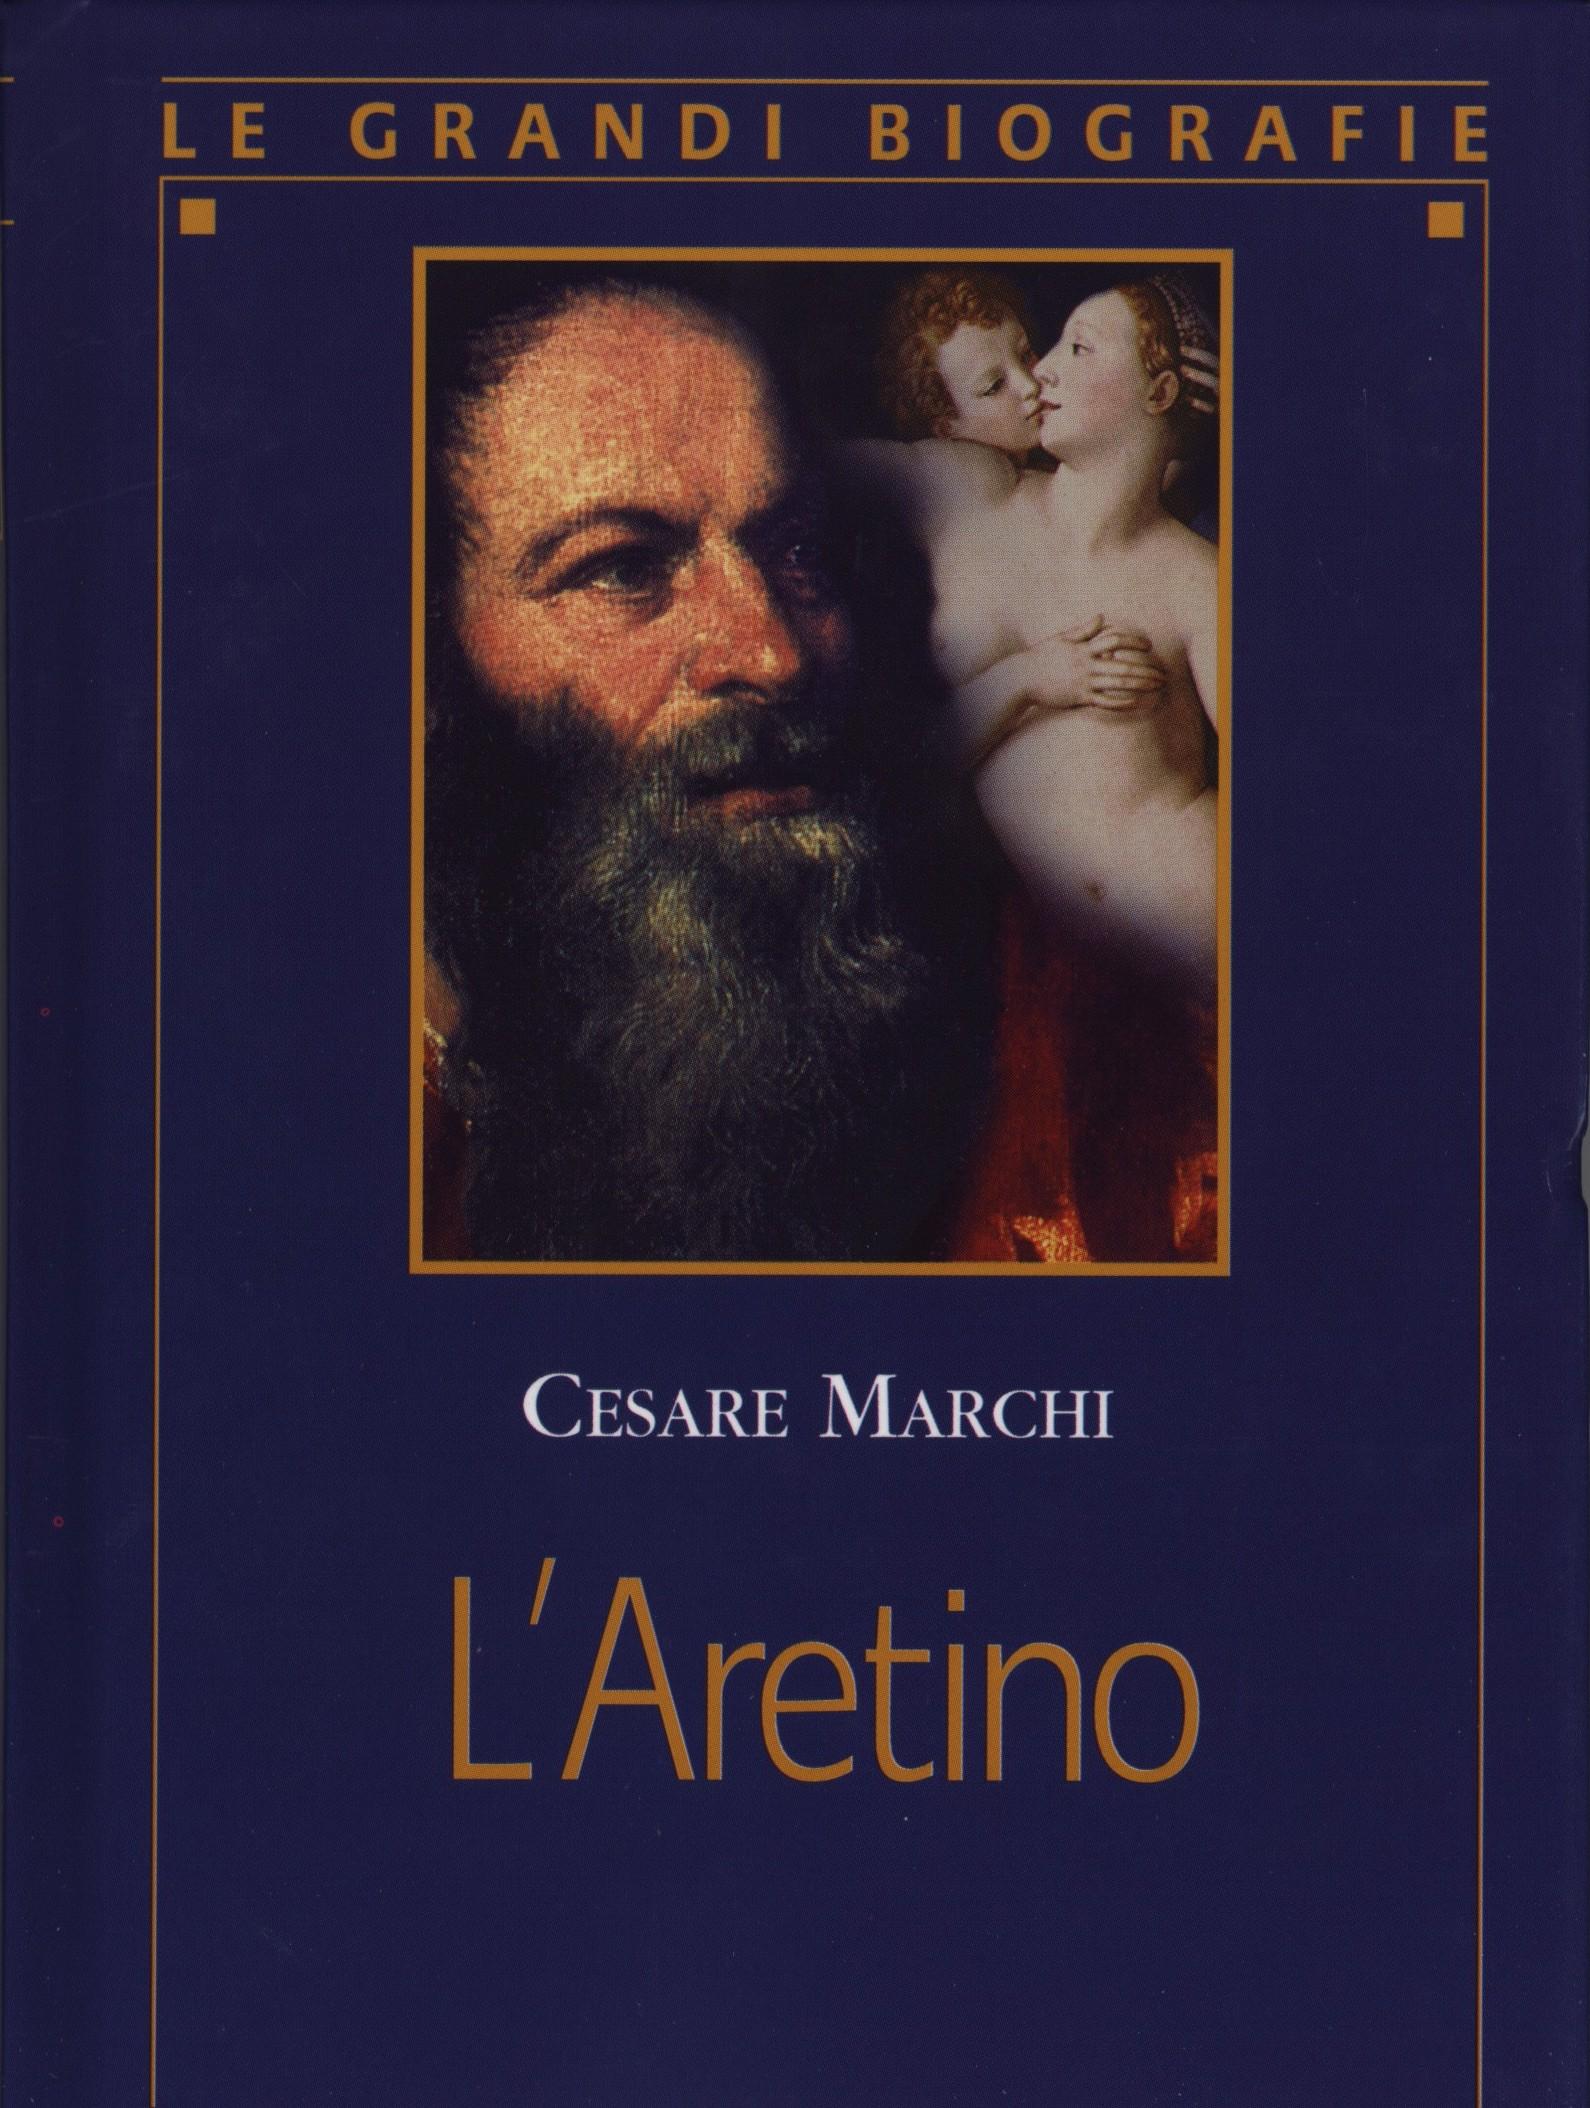 L'Aretino